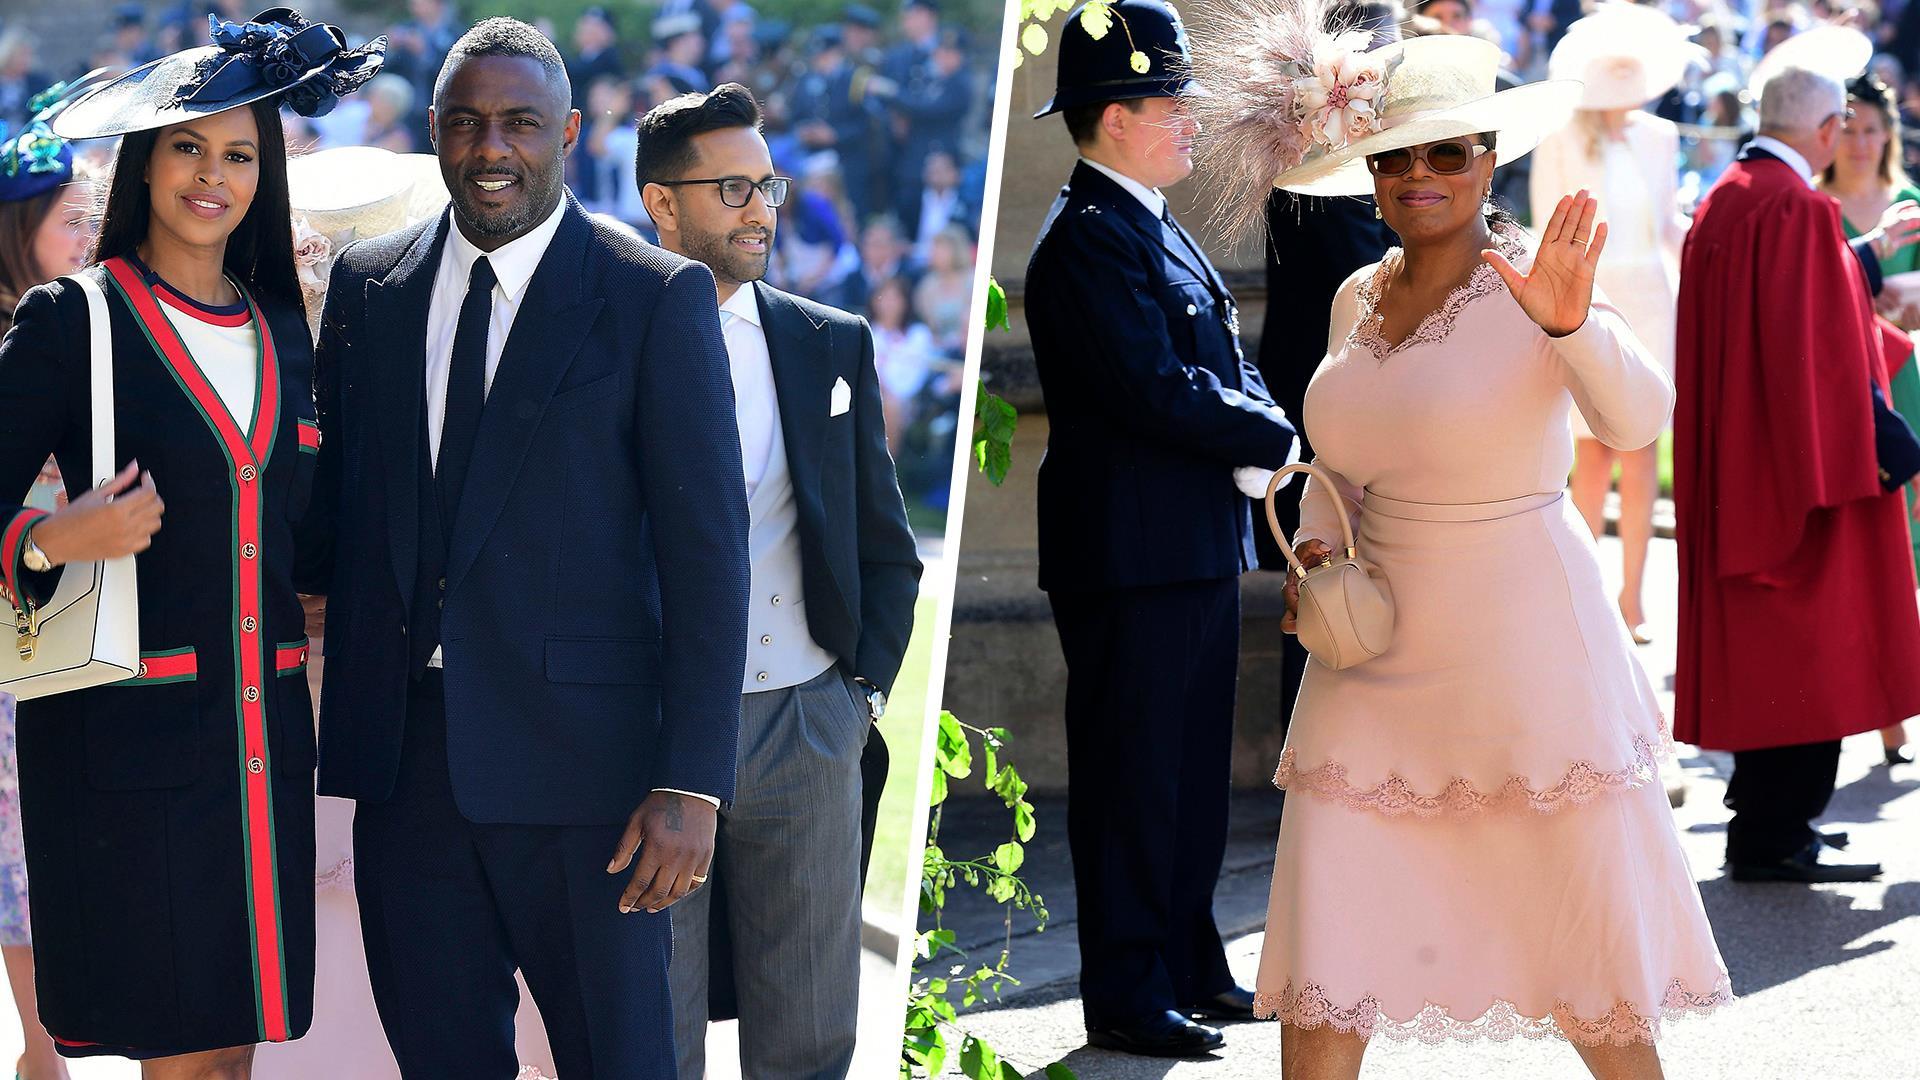 Oprah Winfrey Royal Wedding.Royal Wedding Idris Elba Oprah Winfrey More Arrive At Windsor Castle